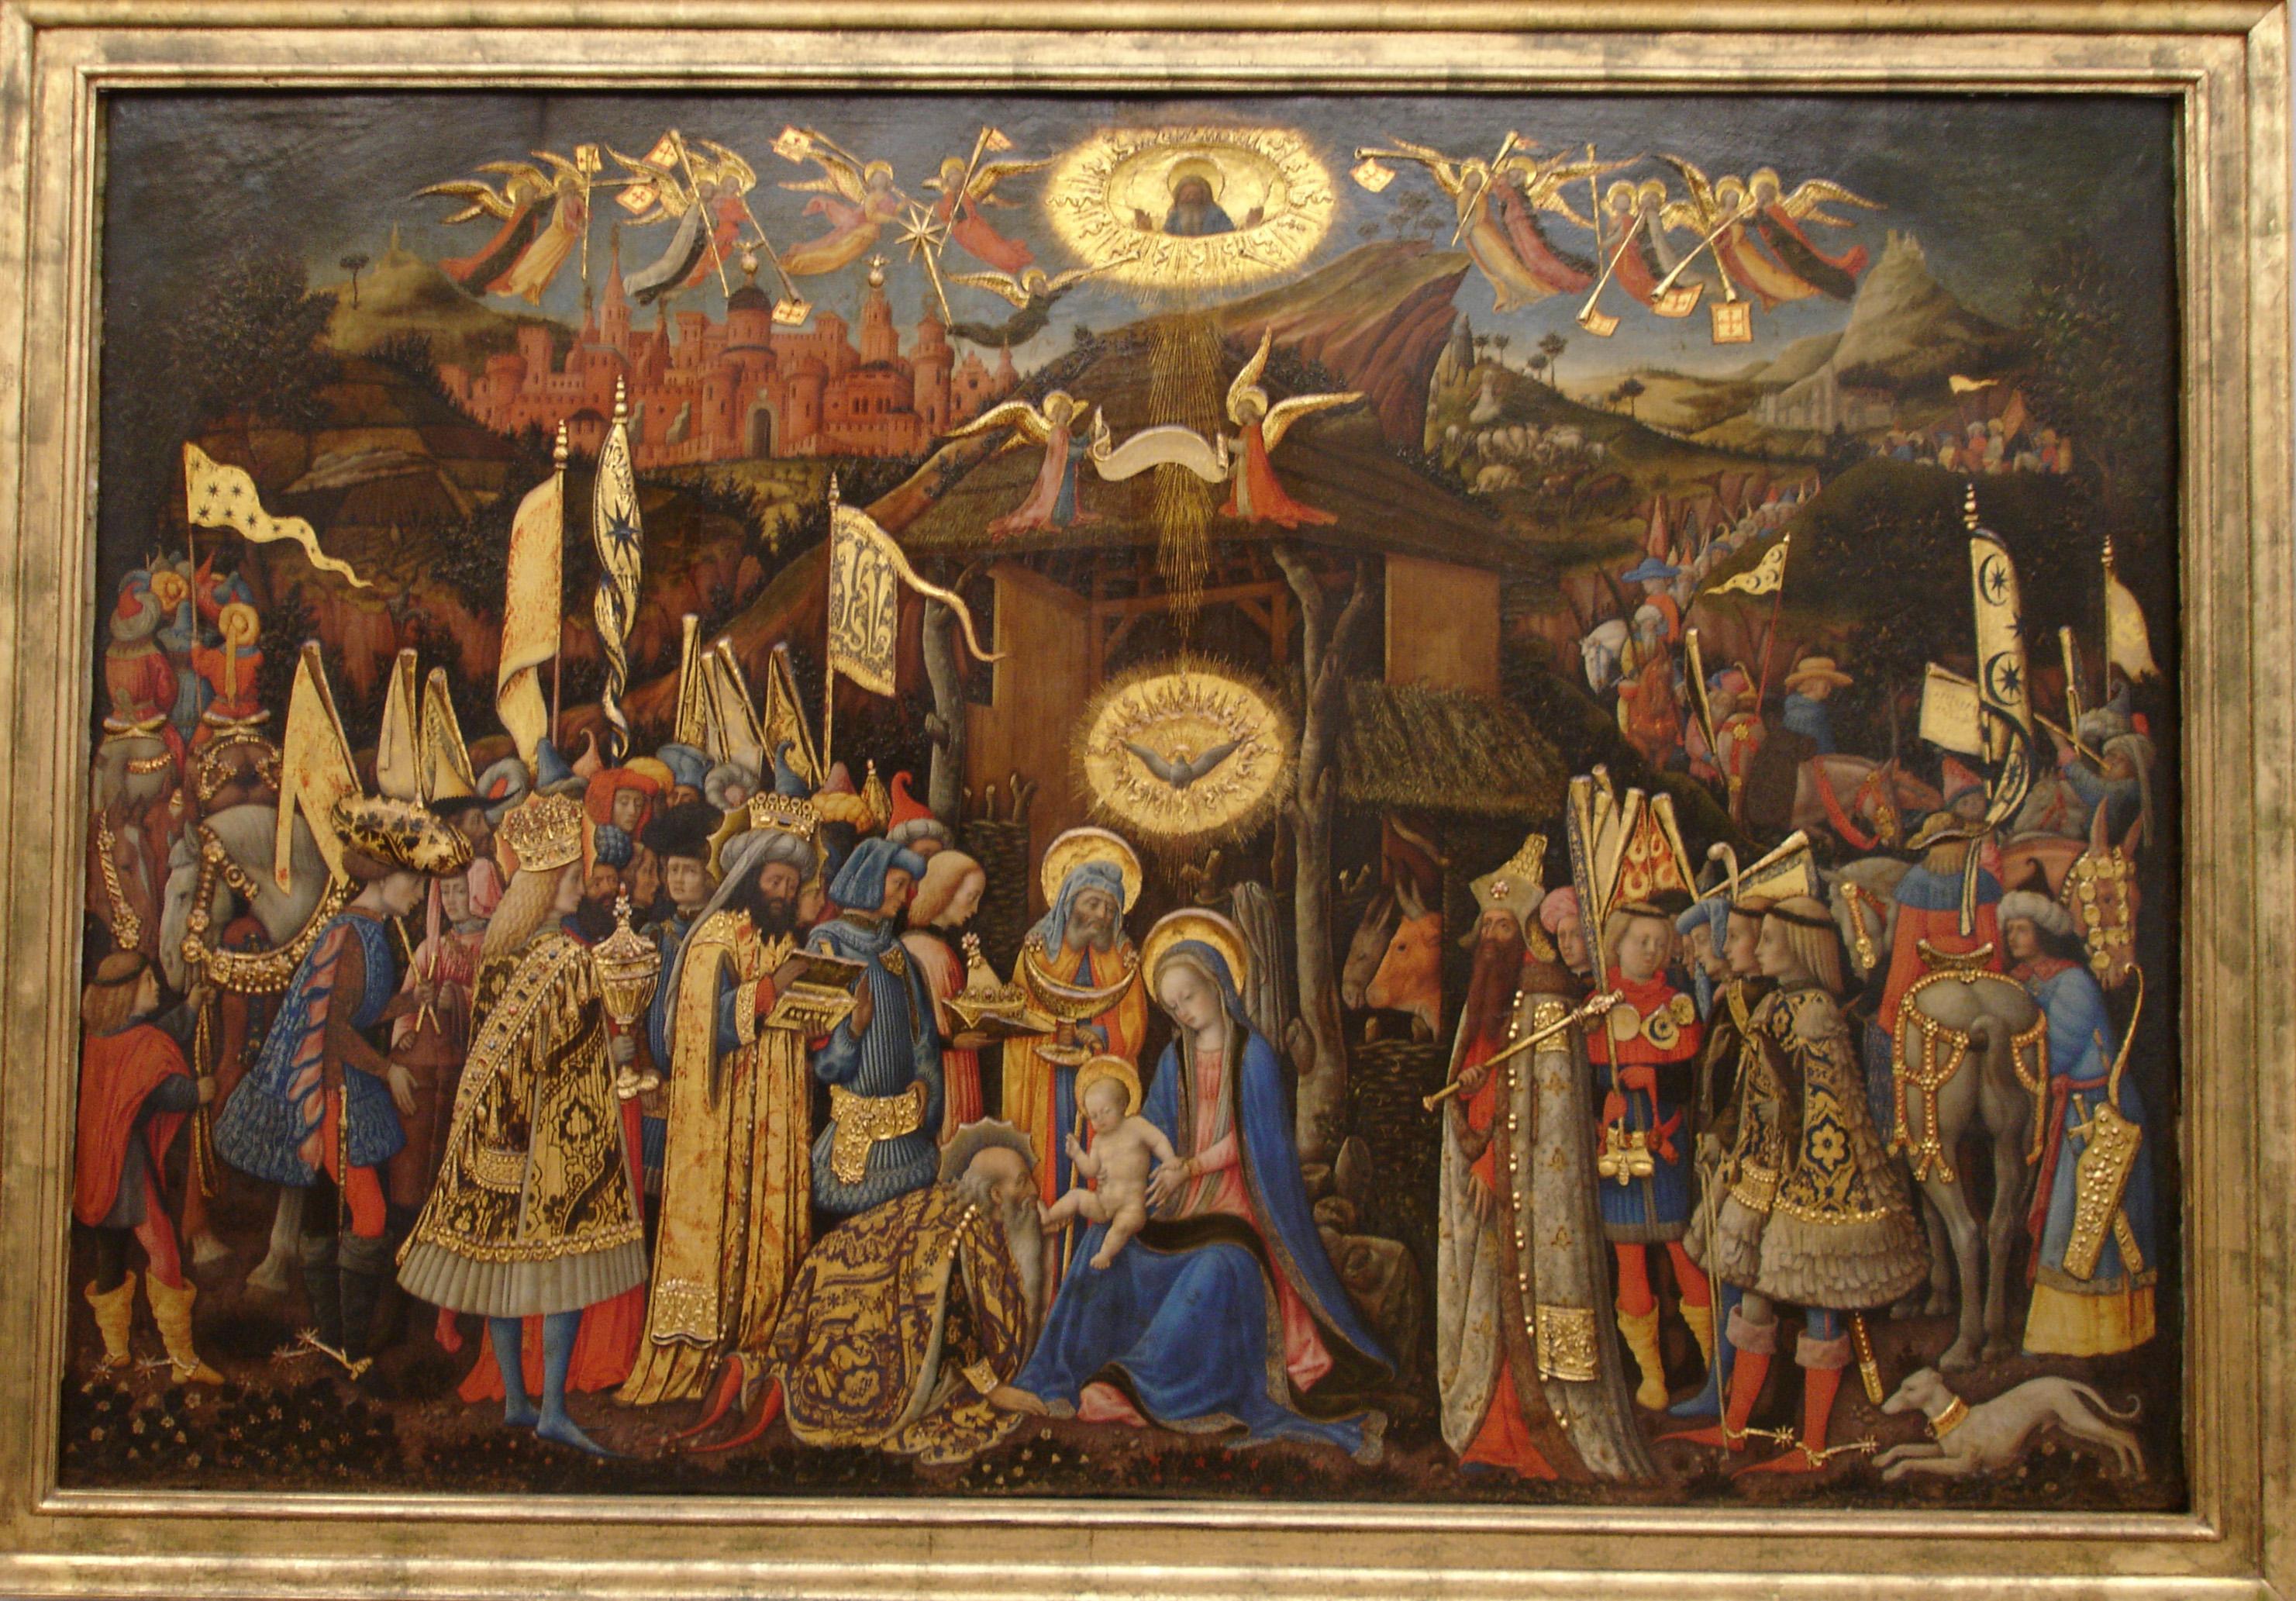 GBGM Vivarini The Adoration of the Kings